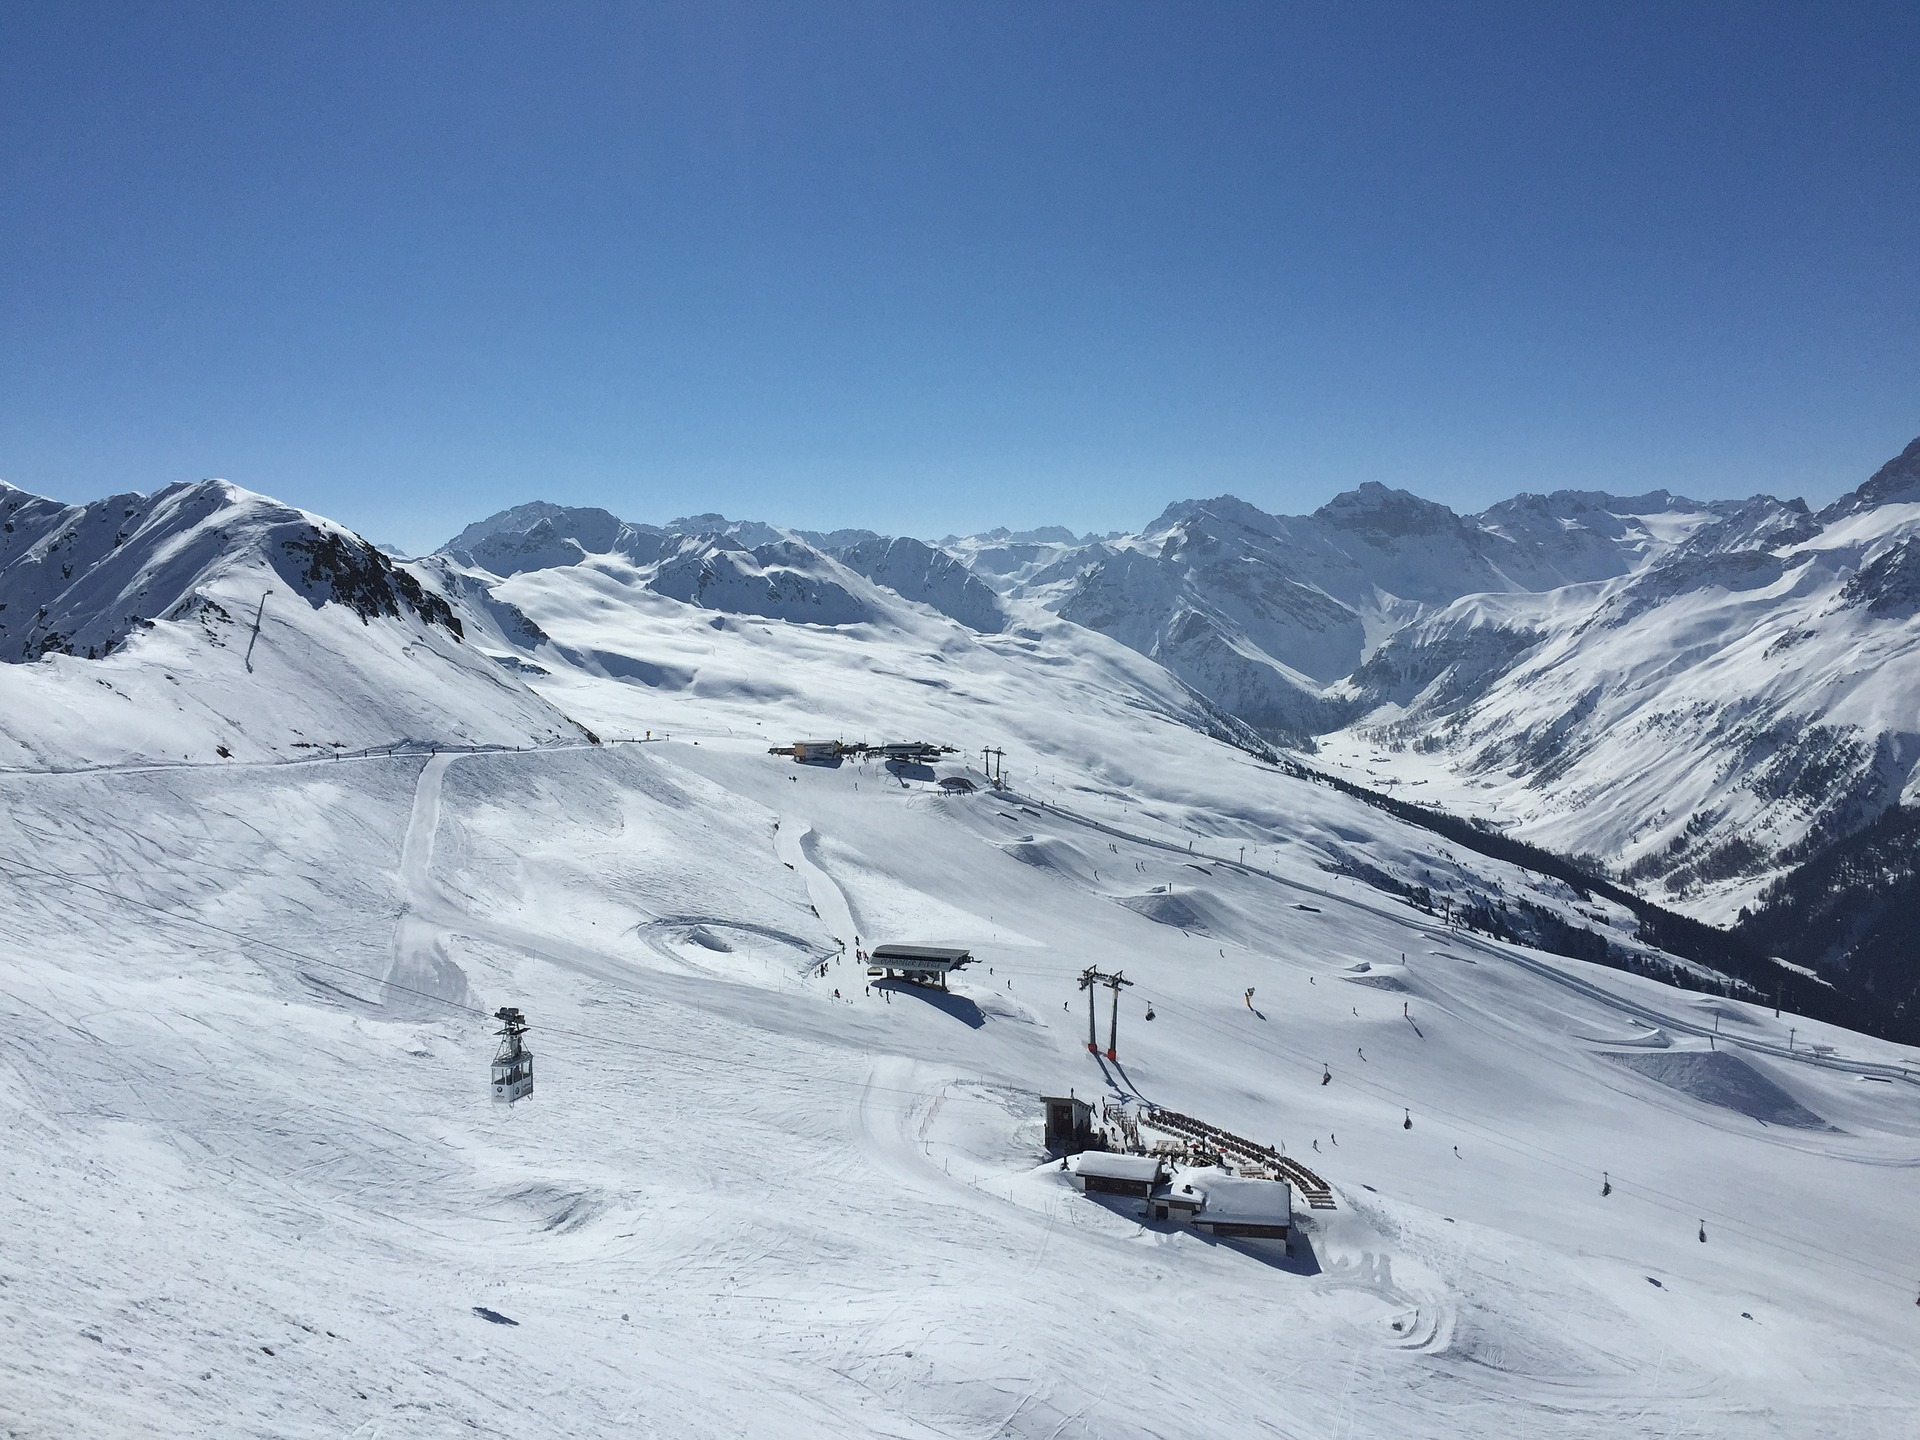 Adelboden ski resort